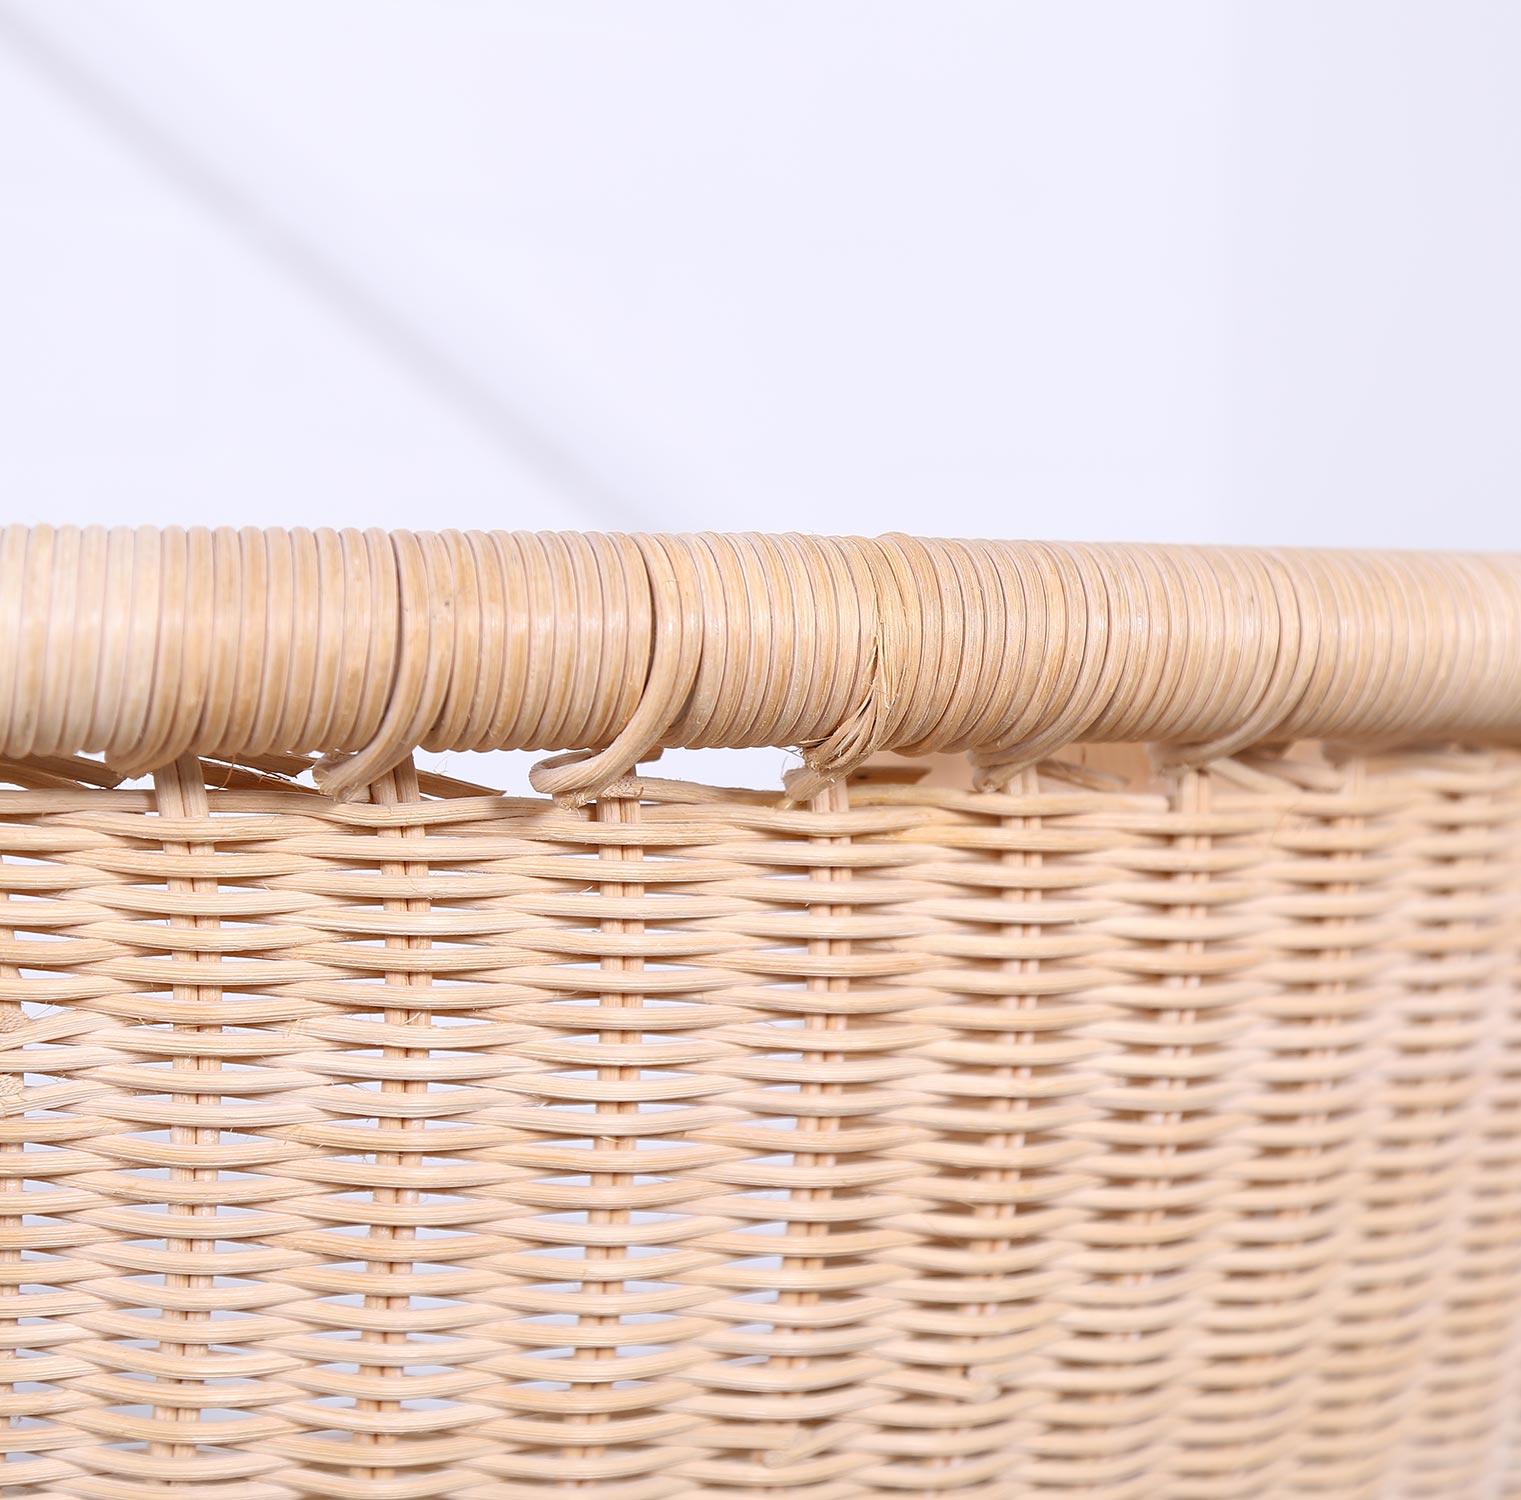 Tecta d43 chair stuhl wicker kastholm fabricius mart stam for Designer schwingstuhl